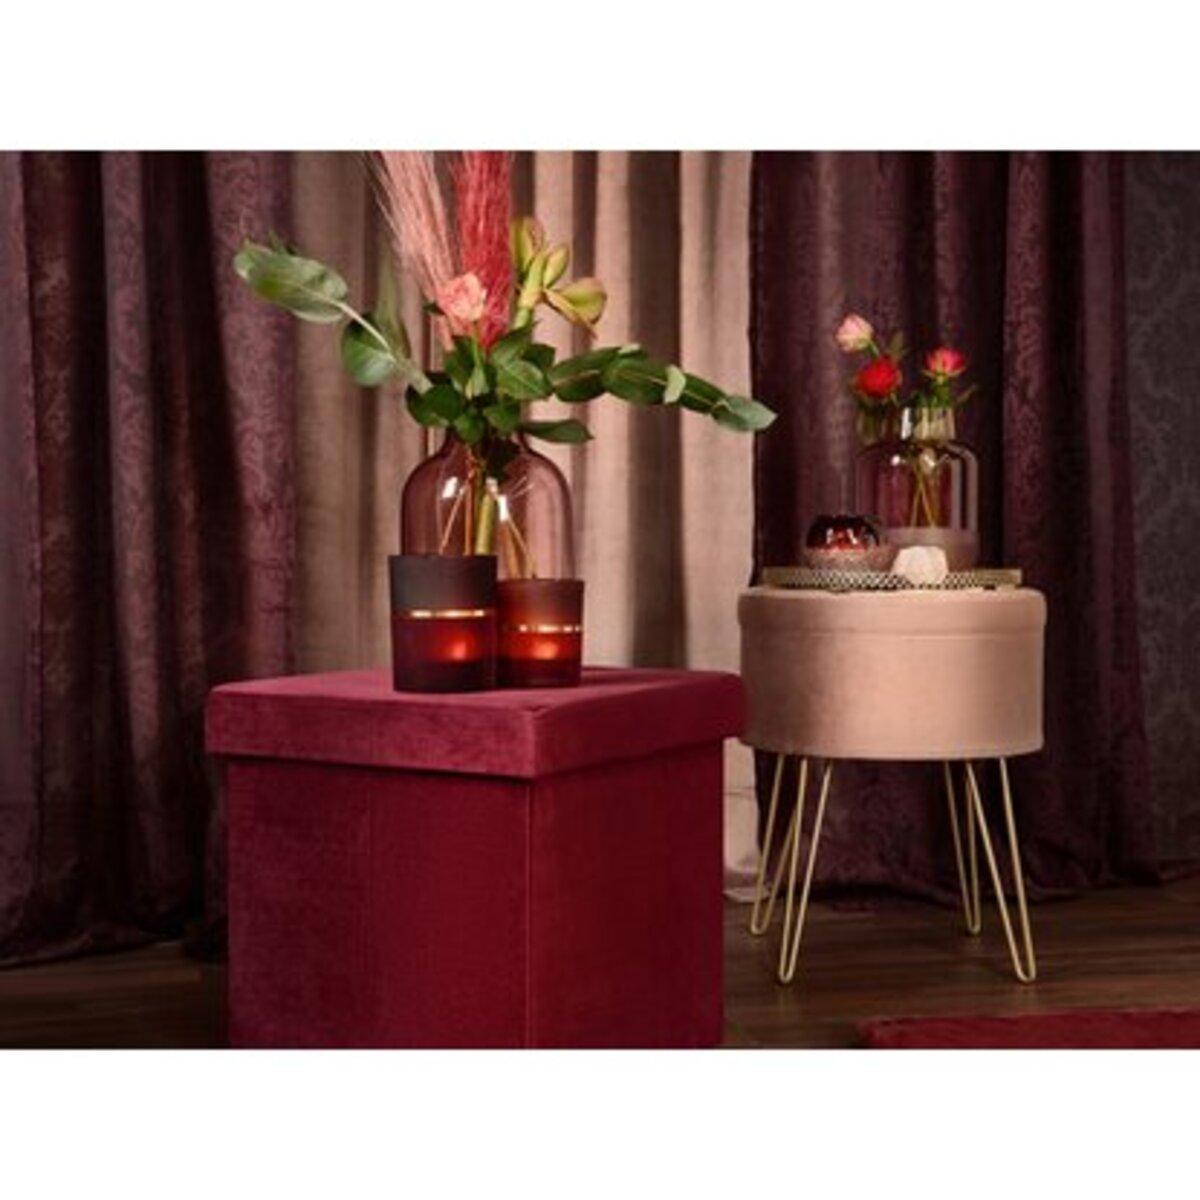 Bild 5 von Sitzhocker Blush Bordeaux MDF 45 cm x Ø 36 cm Rosa